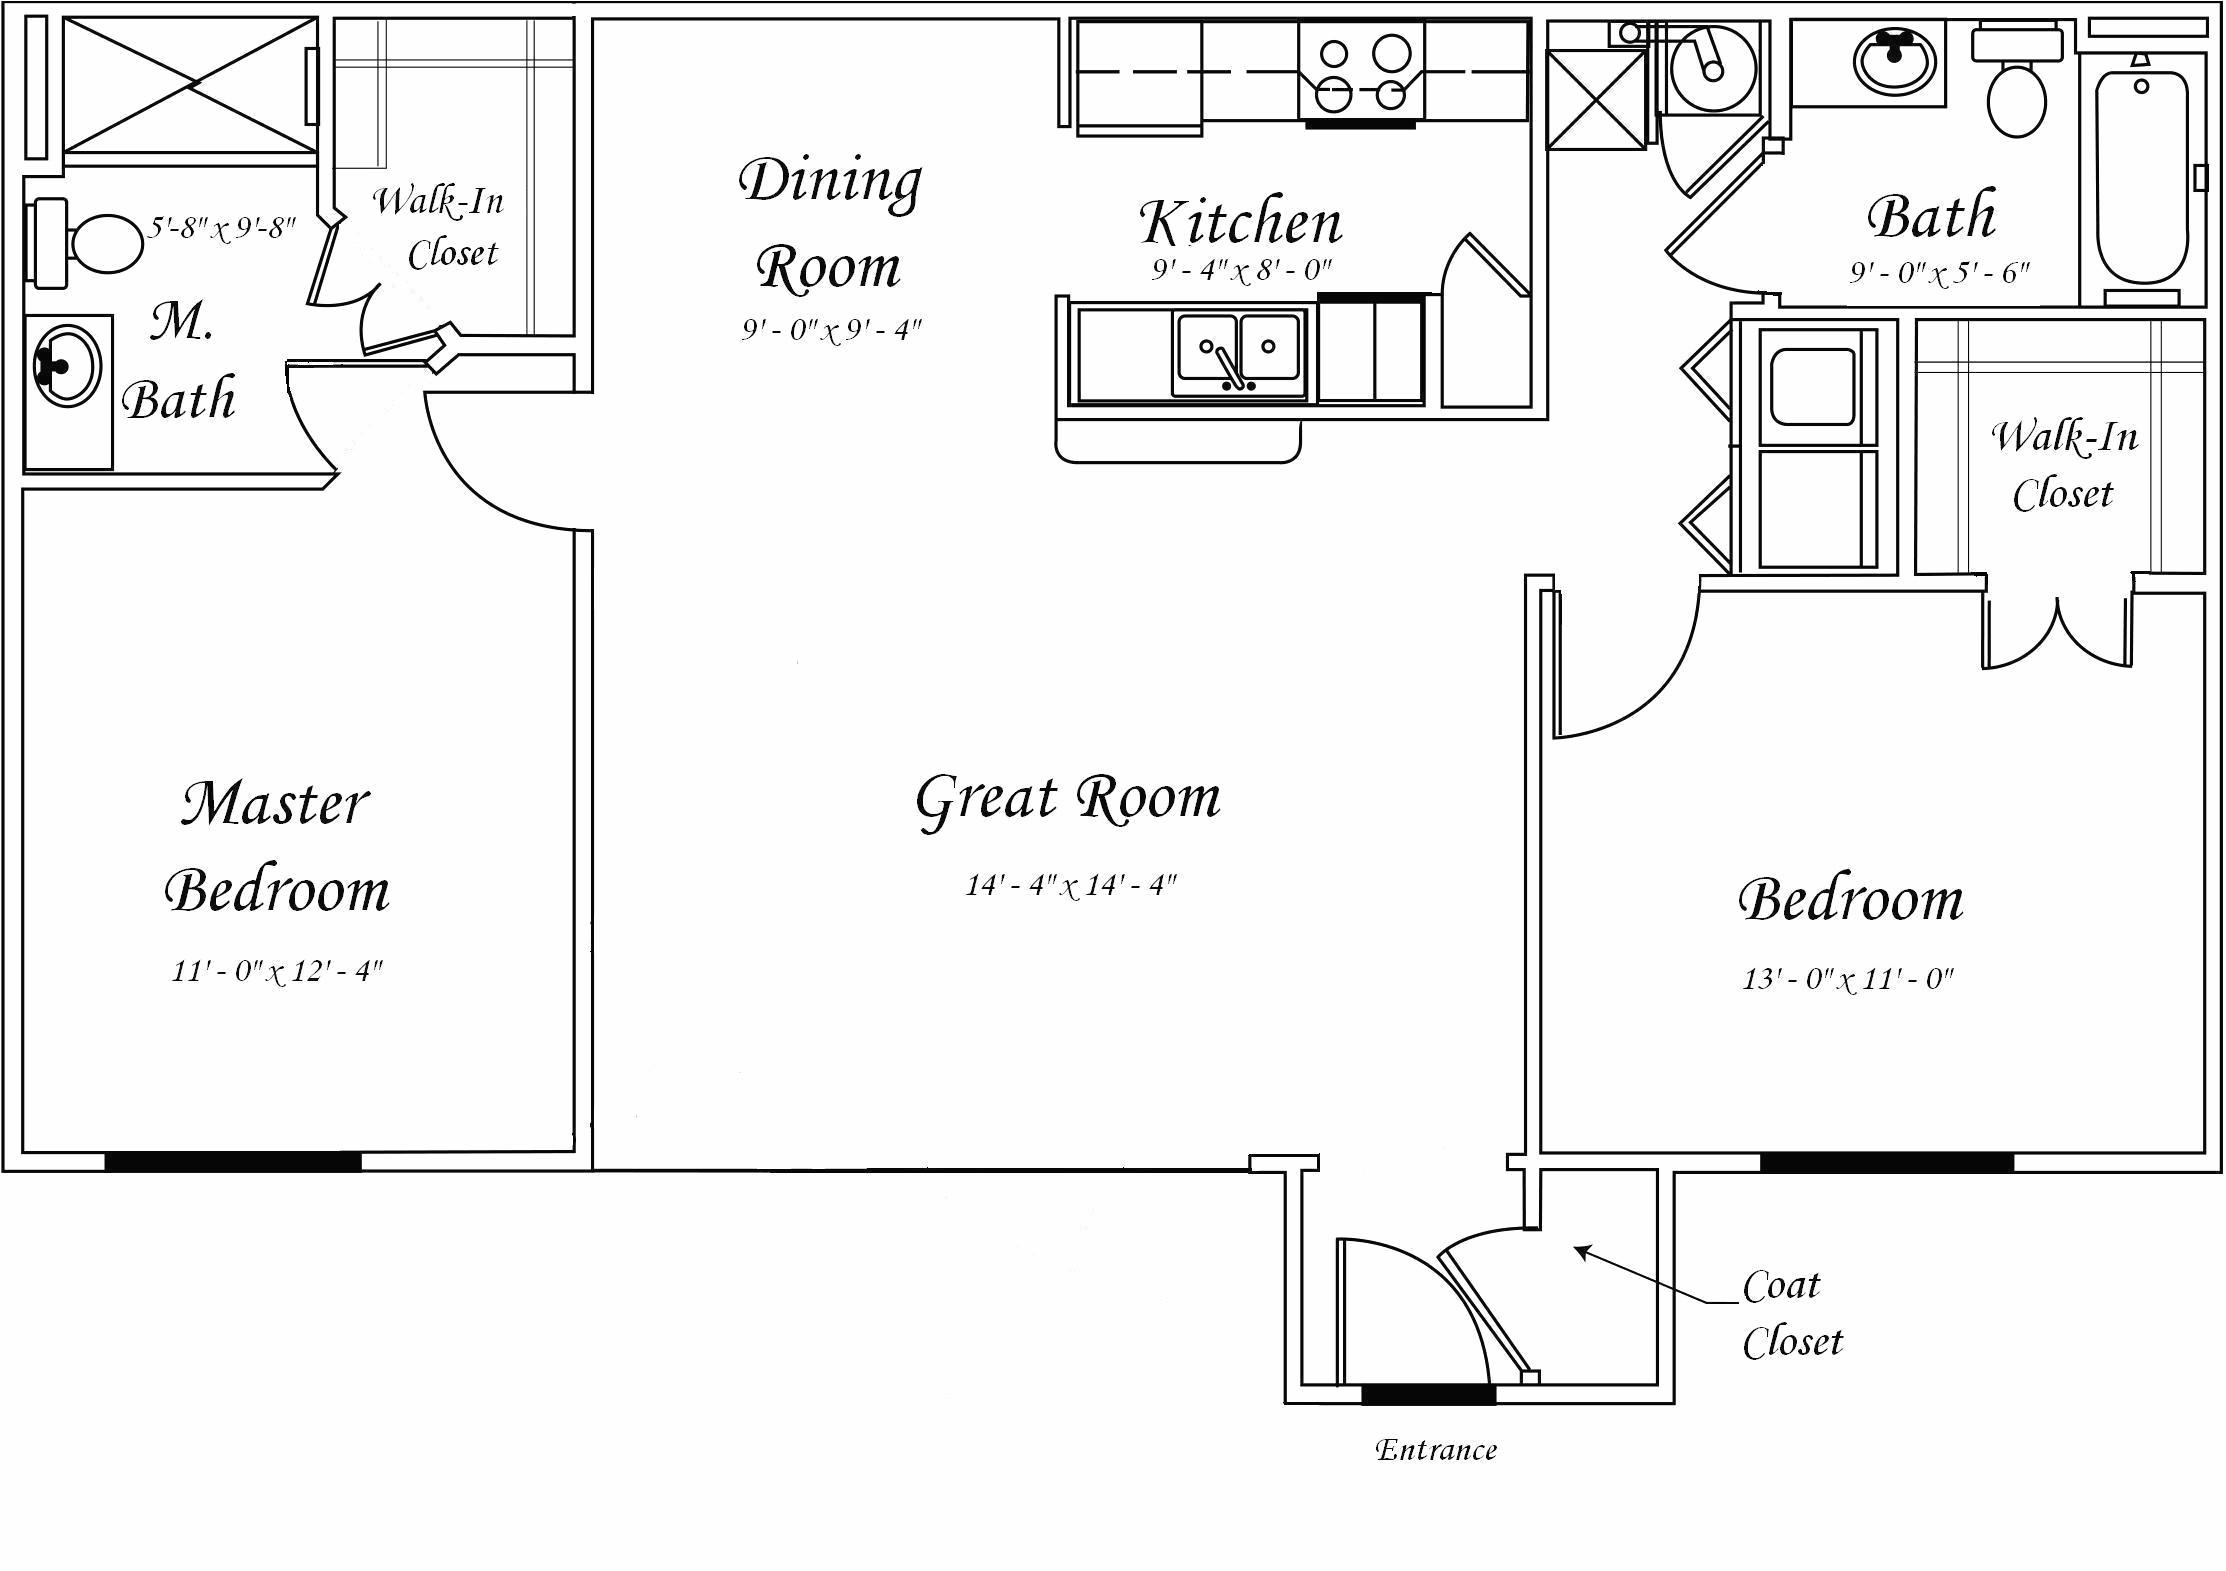 beazer homes floor plans charming beazer homes floor plans fresh old beazer homes floor plans carpet